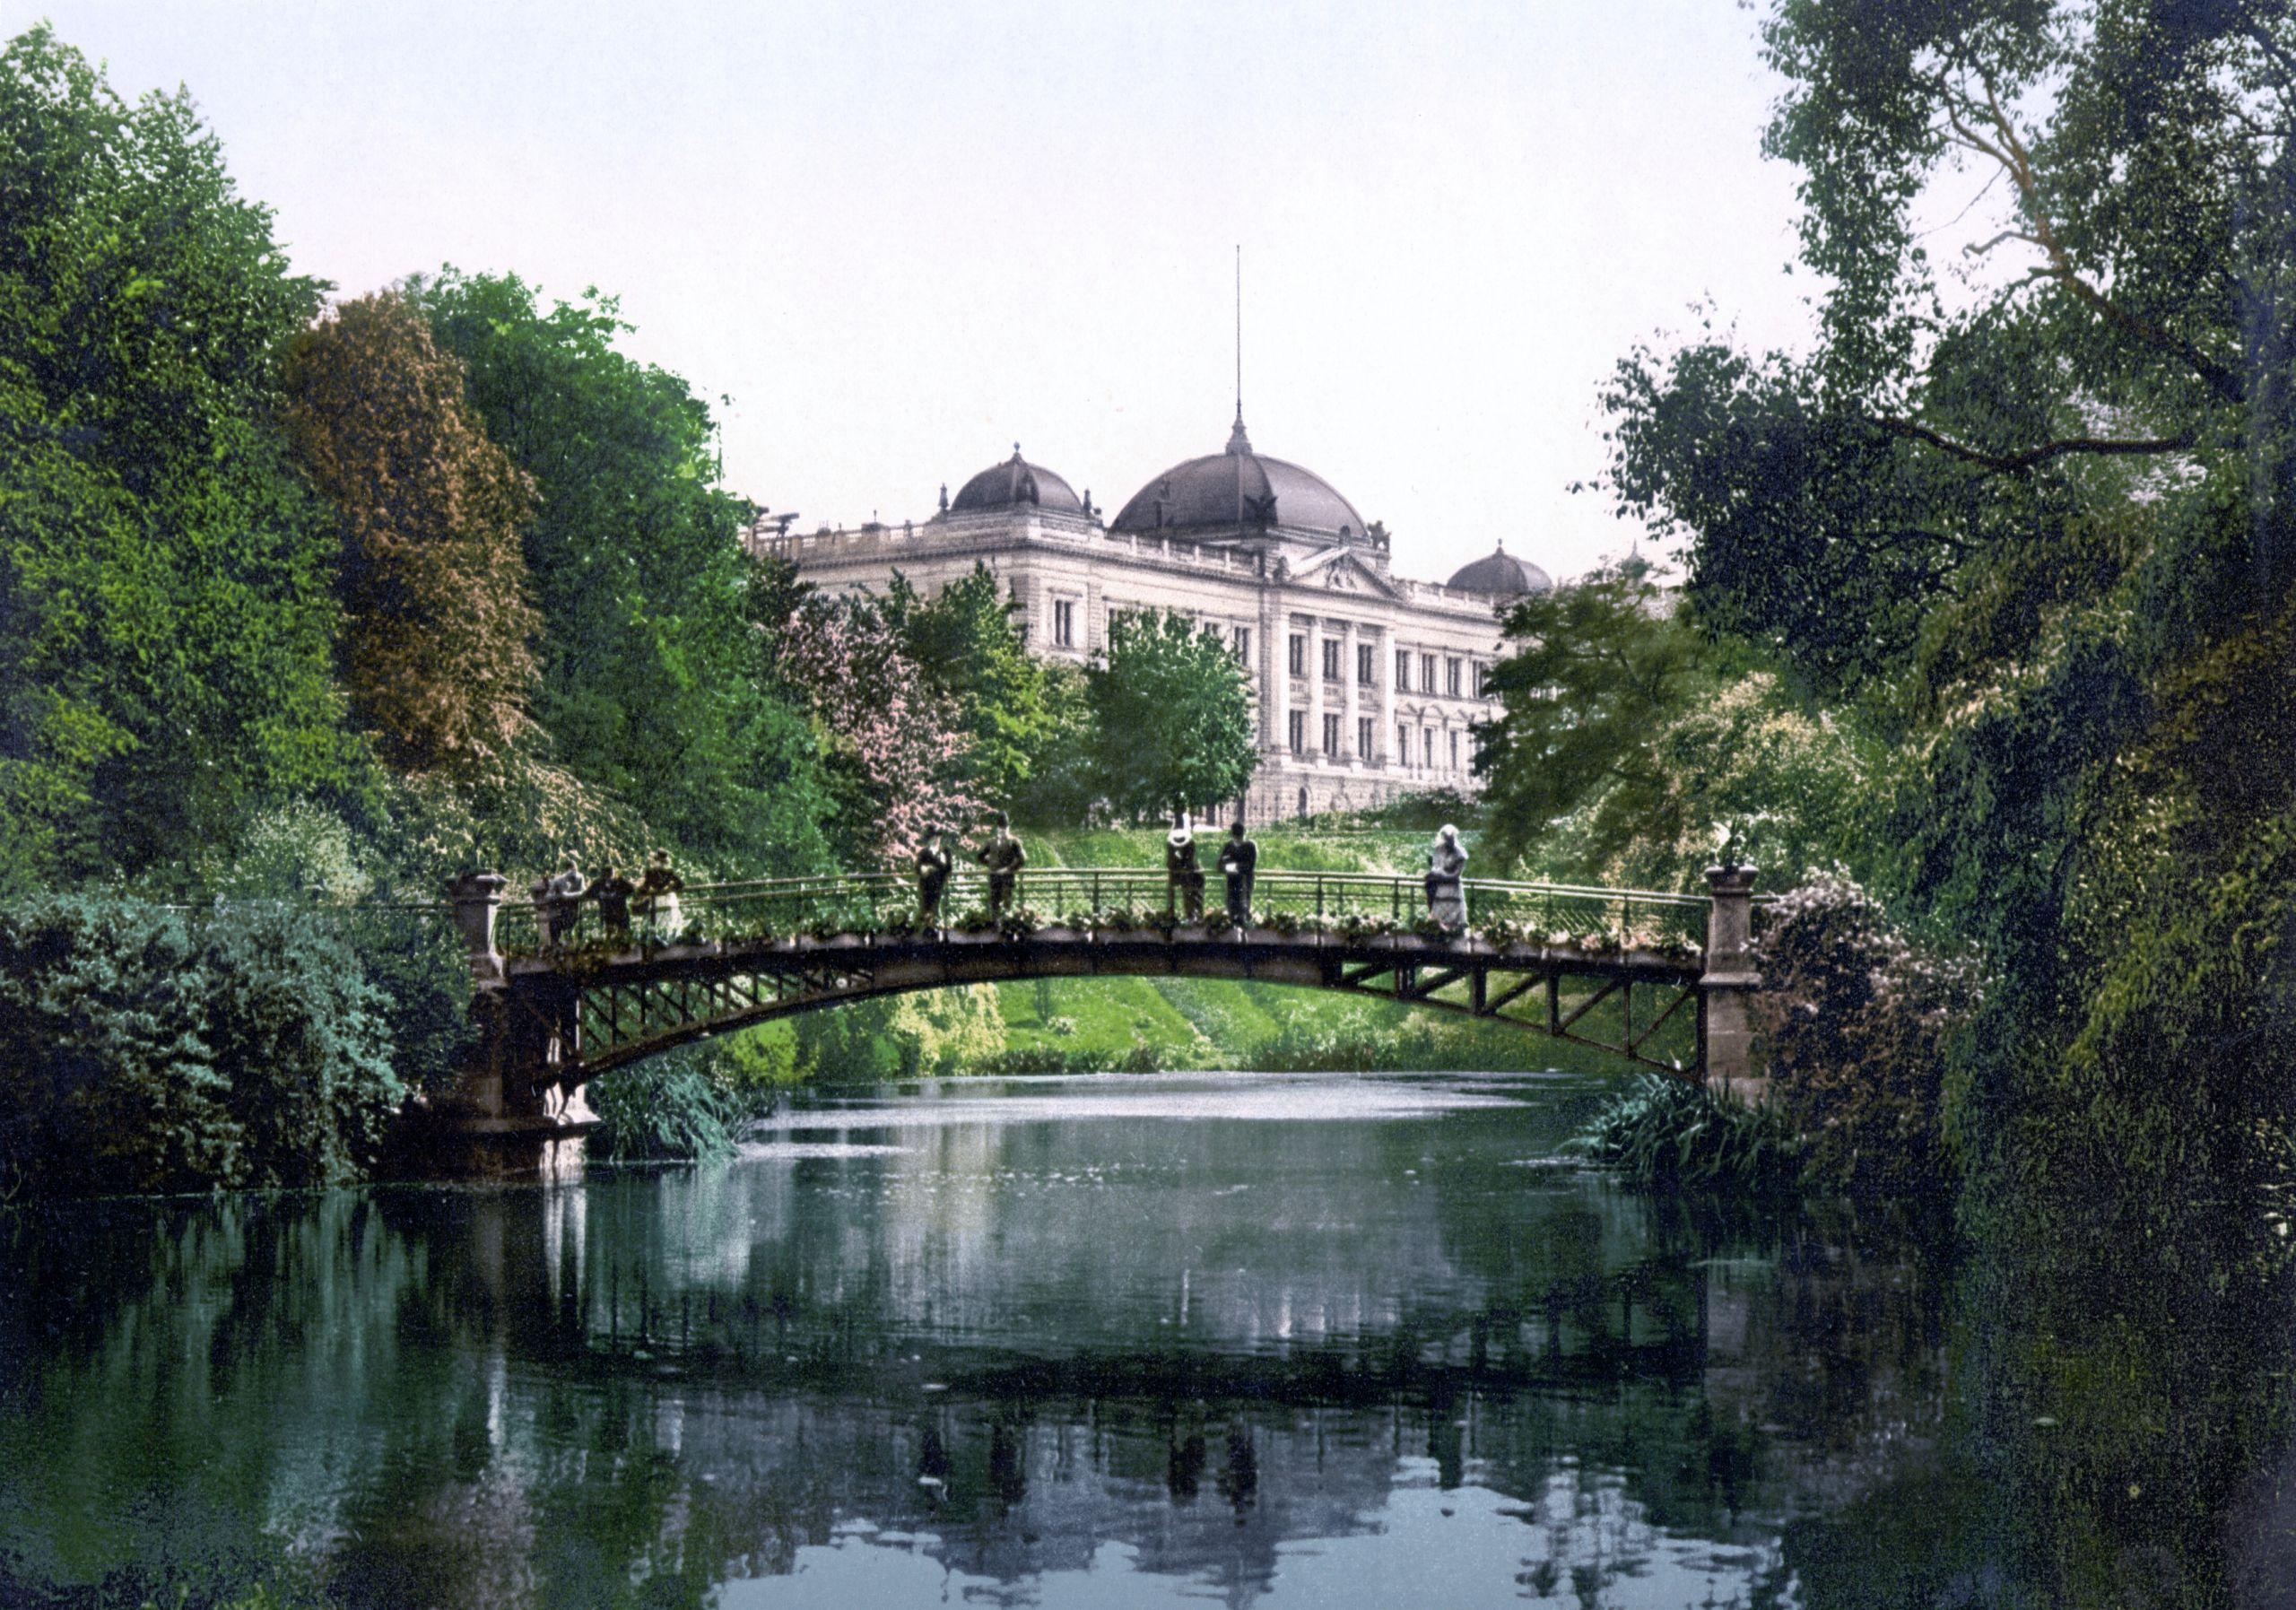 Botanischer Garten Johan van Valckenburgh Bruecke 1900